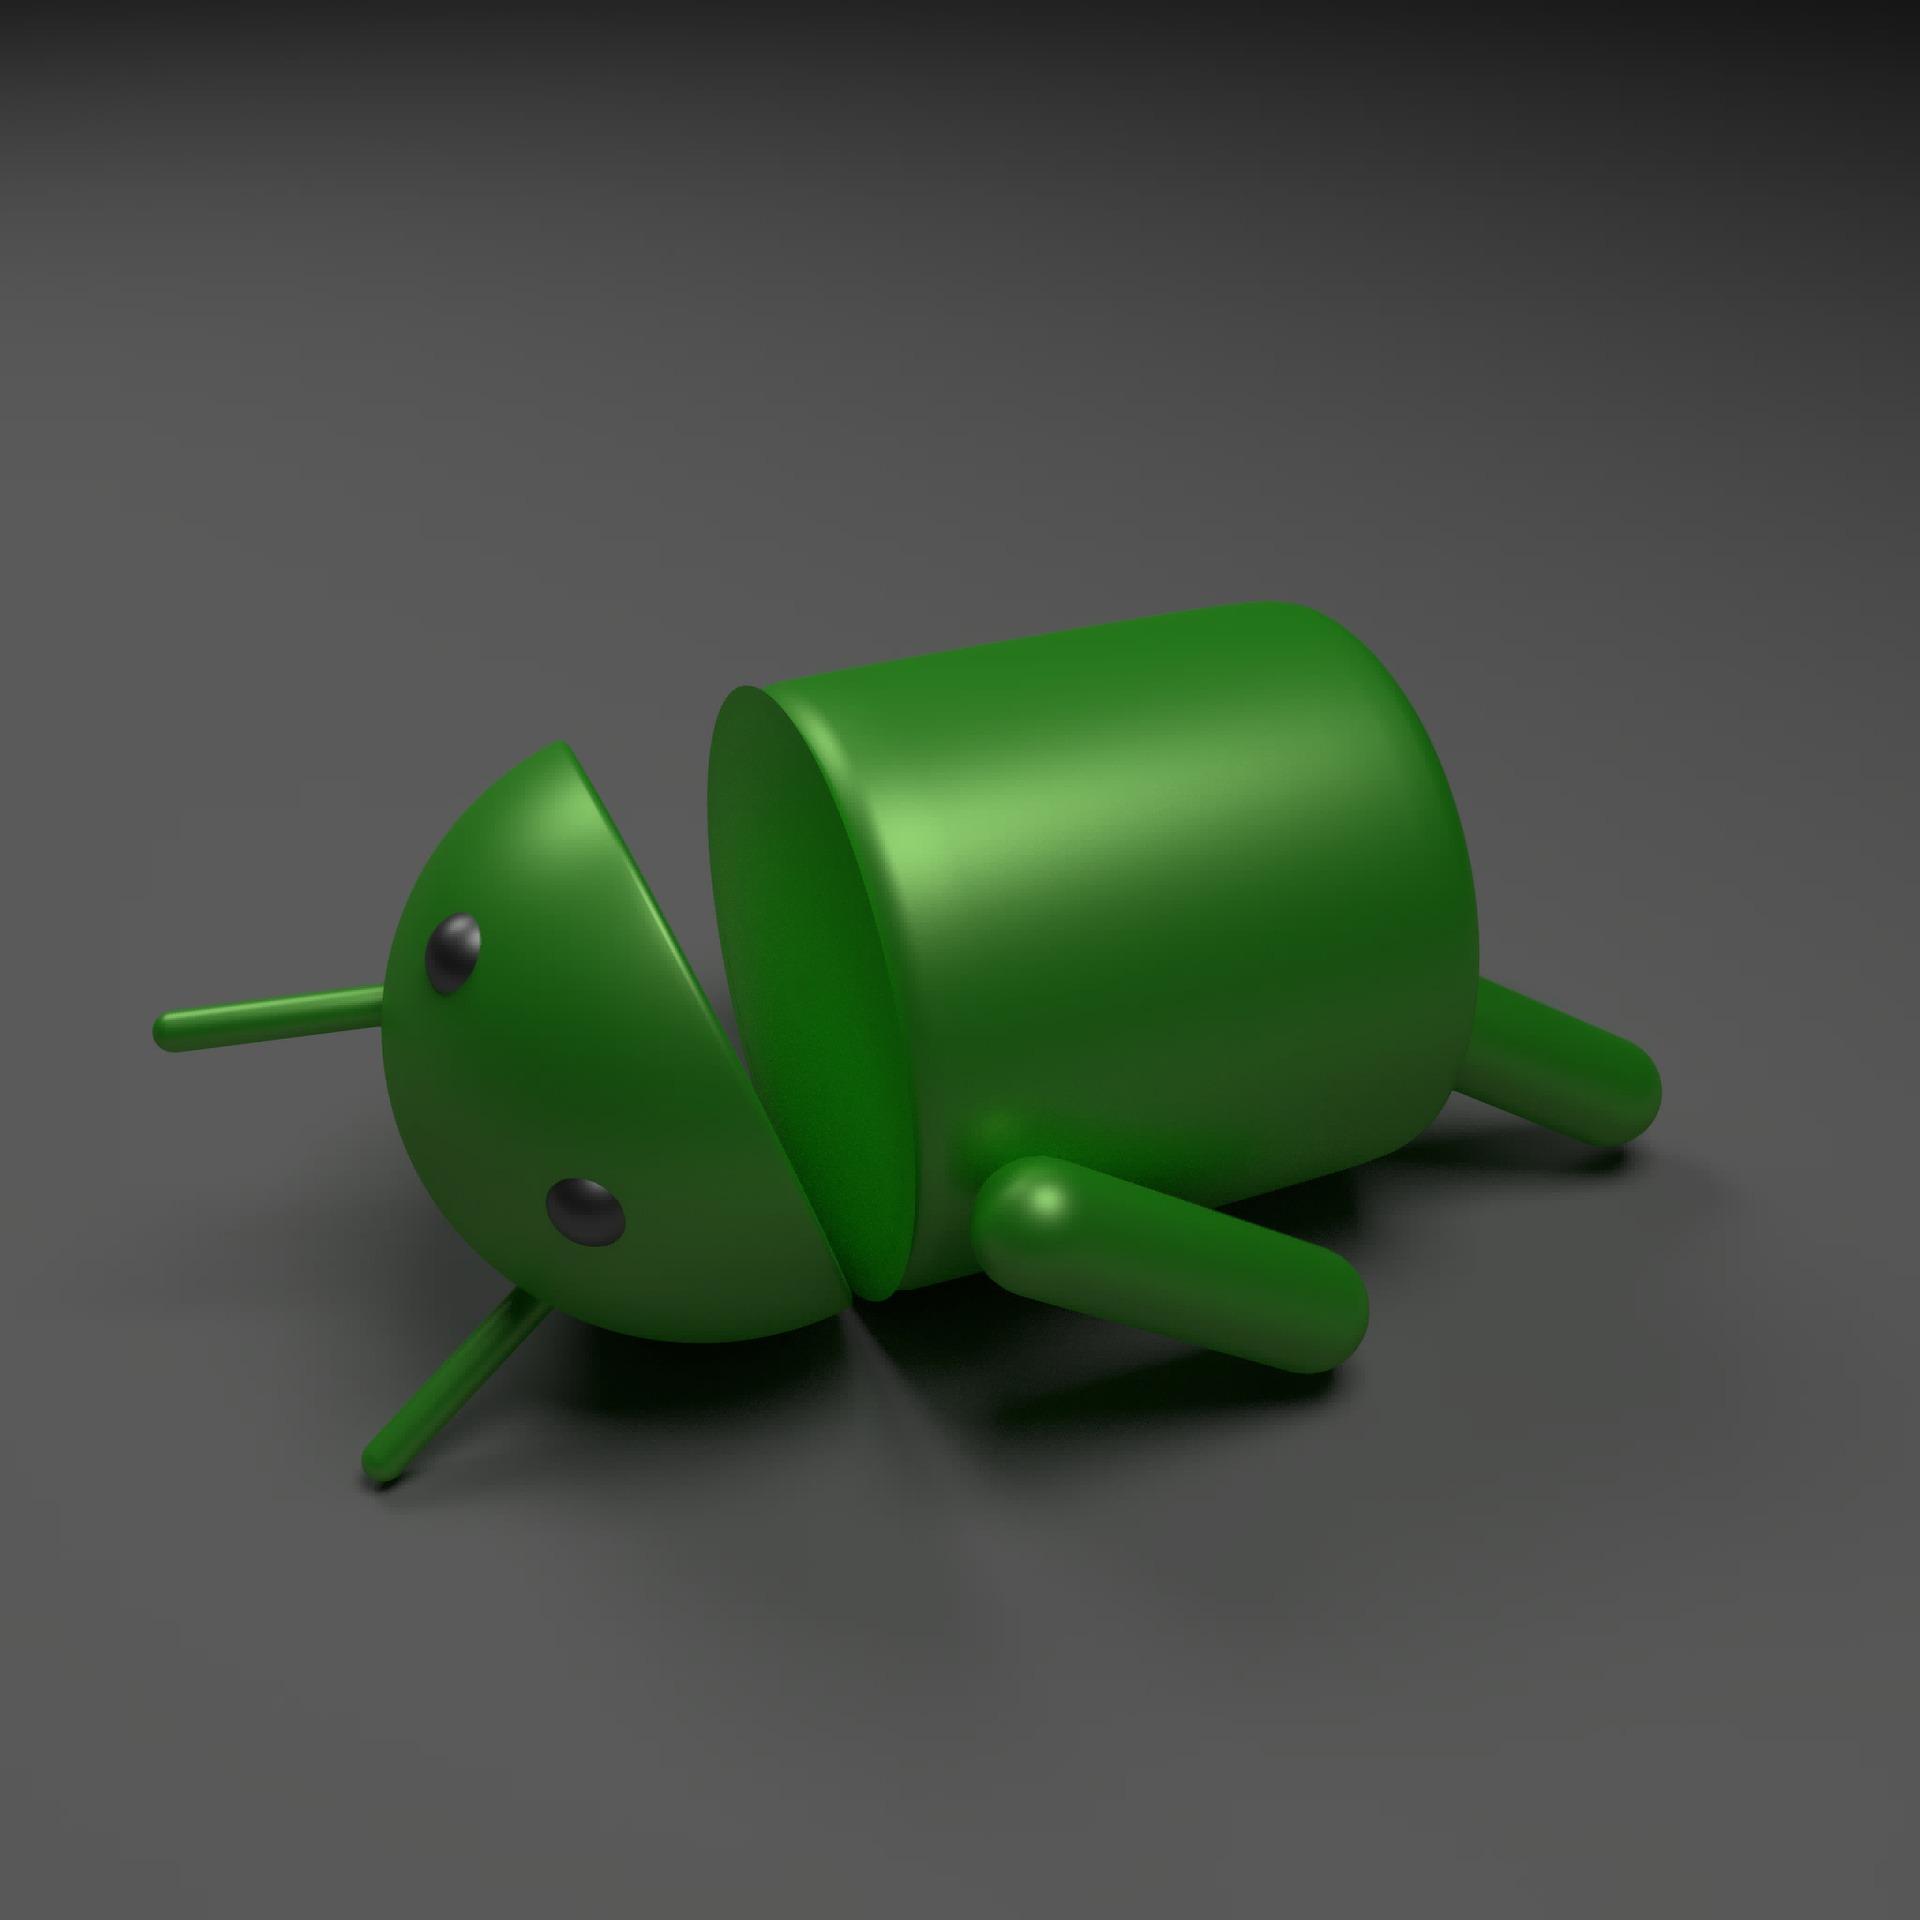 Incremento ciberataques en dispositivos android